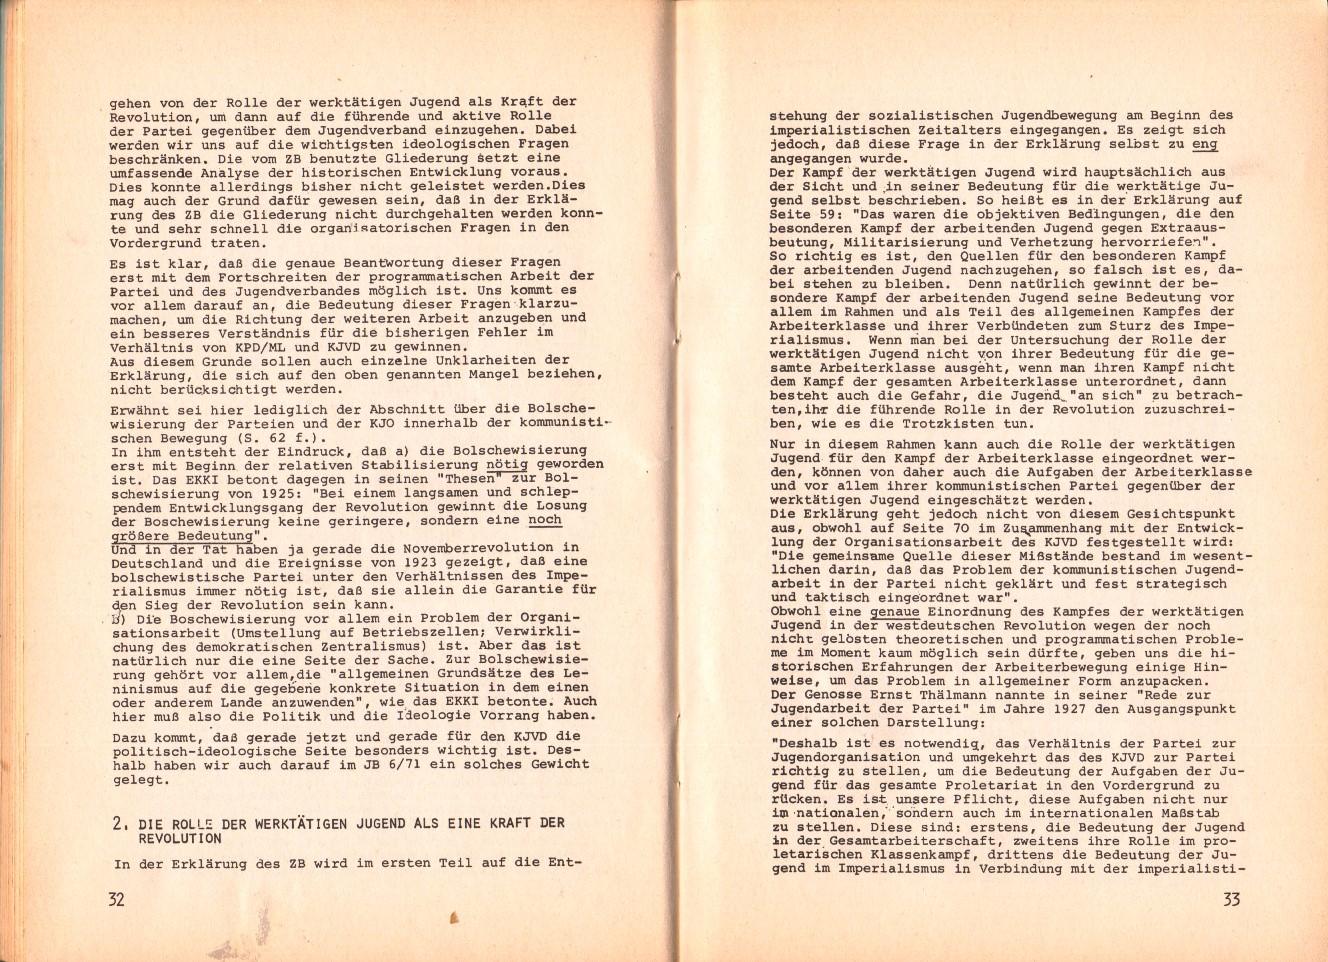 ZB_Parteiarbeiter_1971_10_18